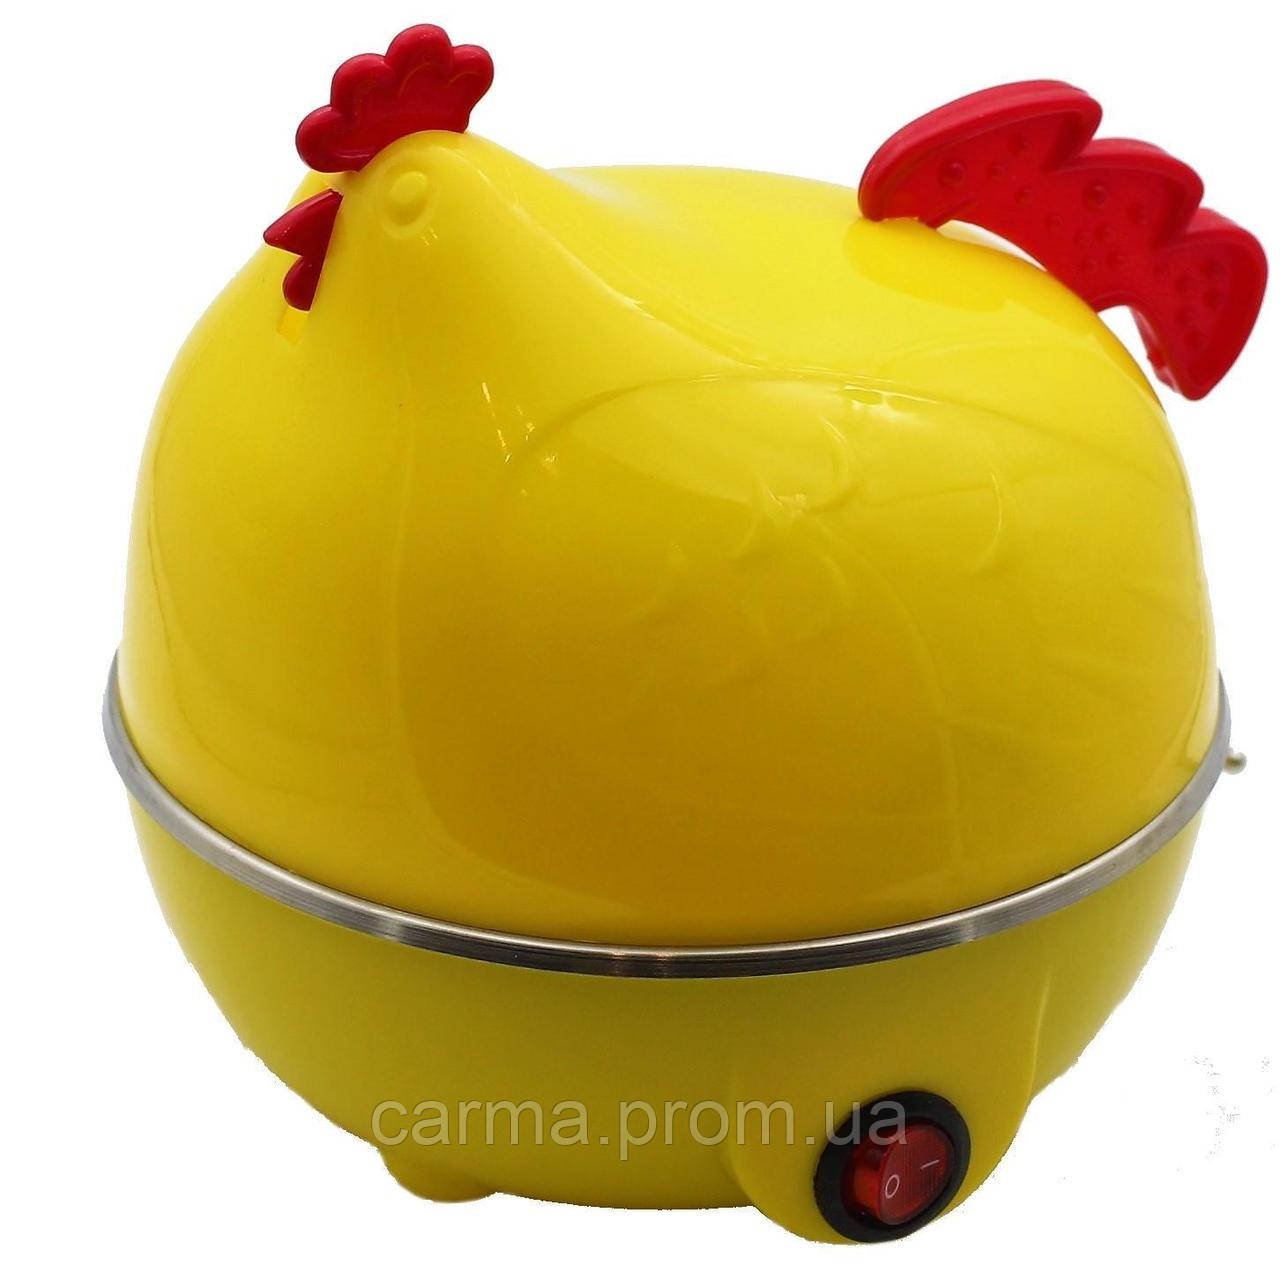 Яйцеварка EGG Cooker на 7 яиц 350W